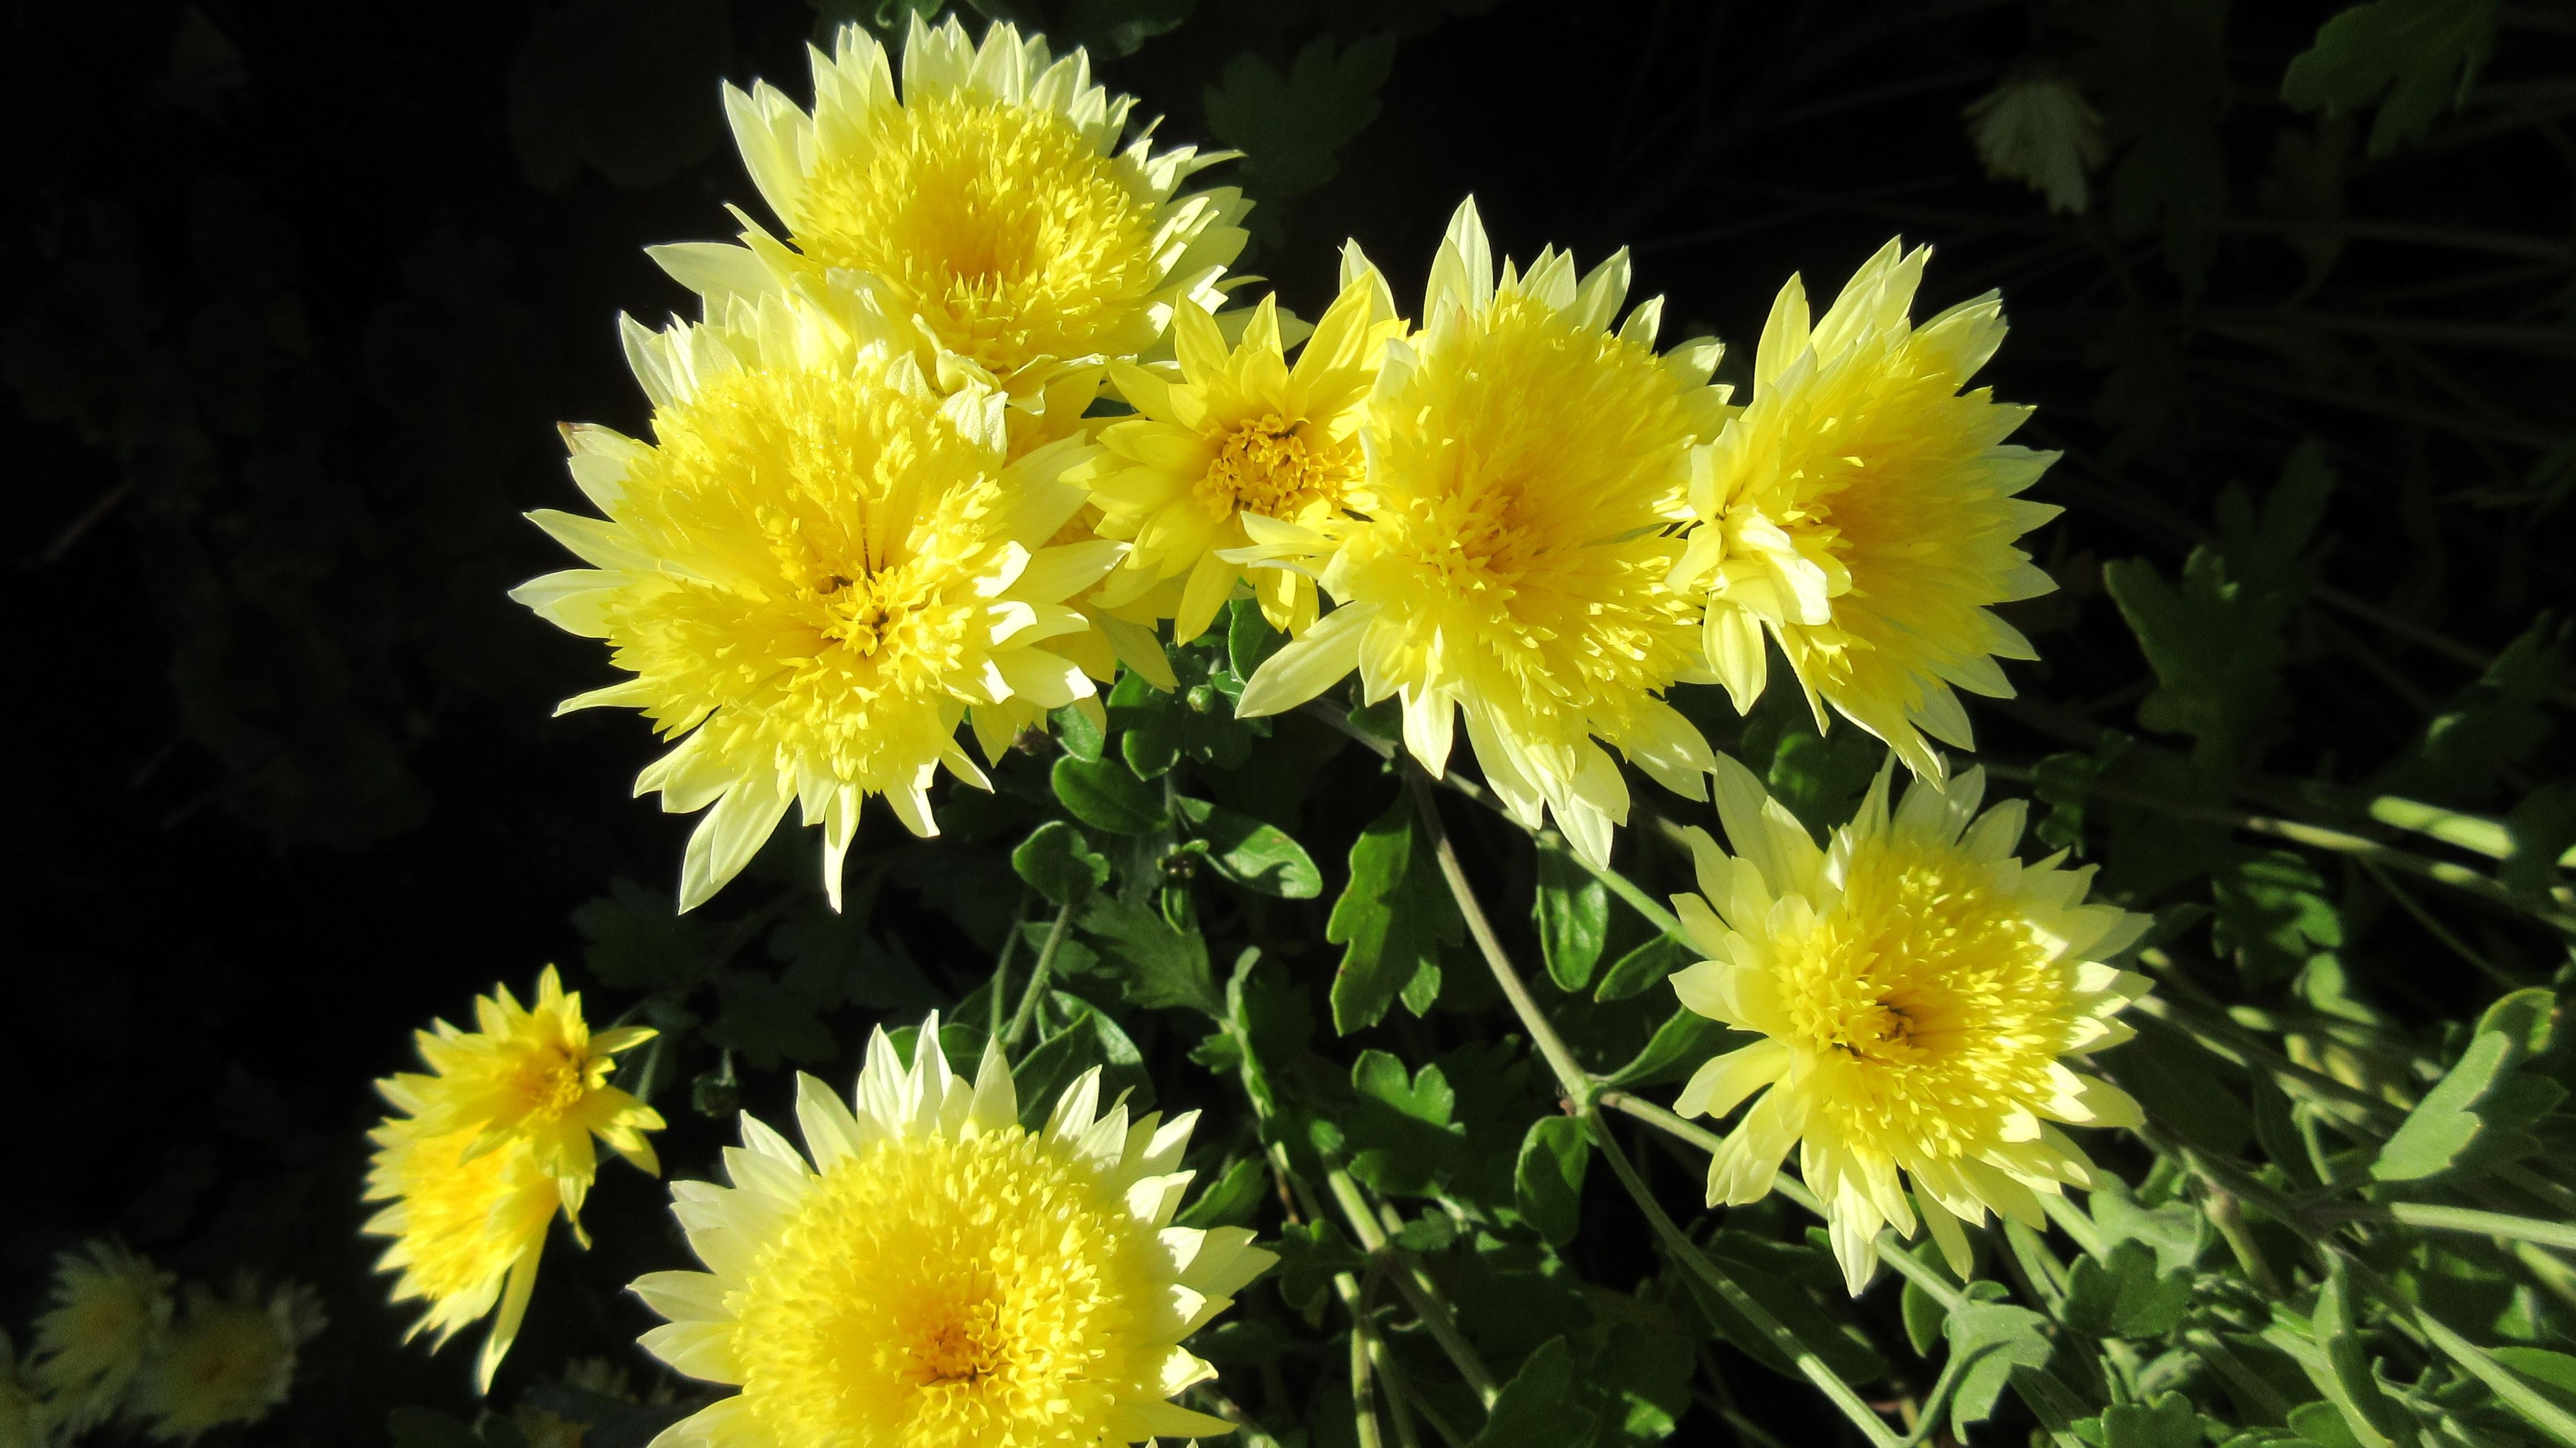 Free Images Nature Dandelion Flower Herb Autumn Botany